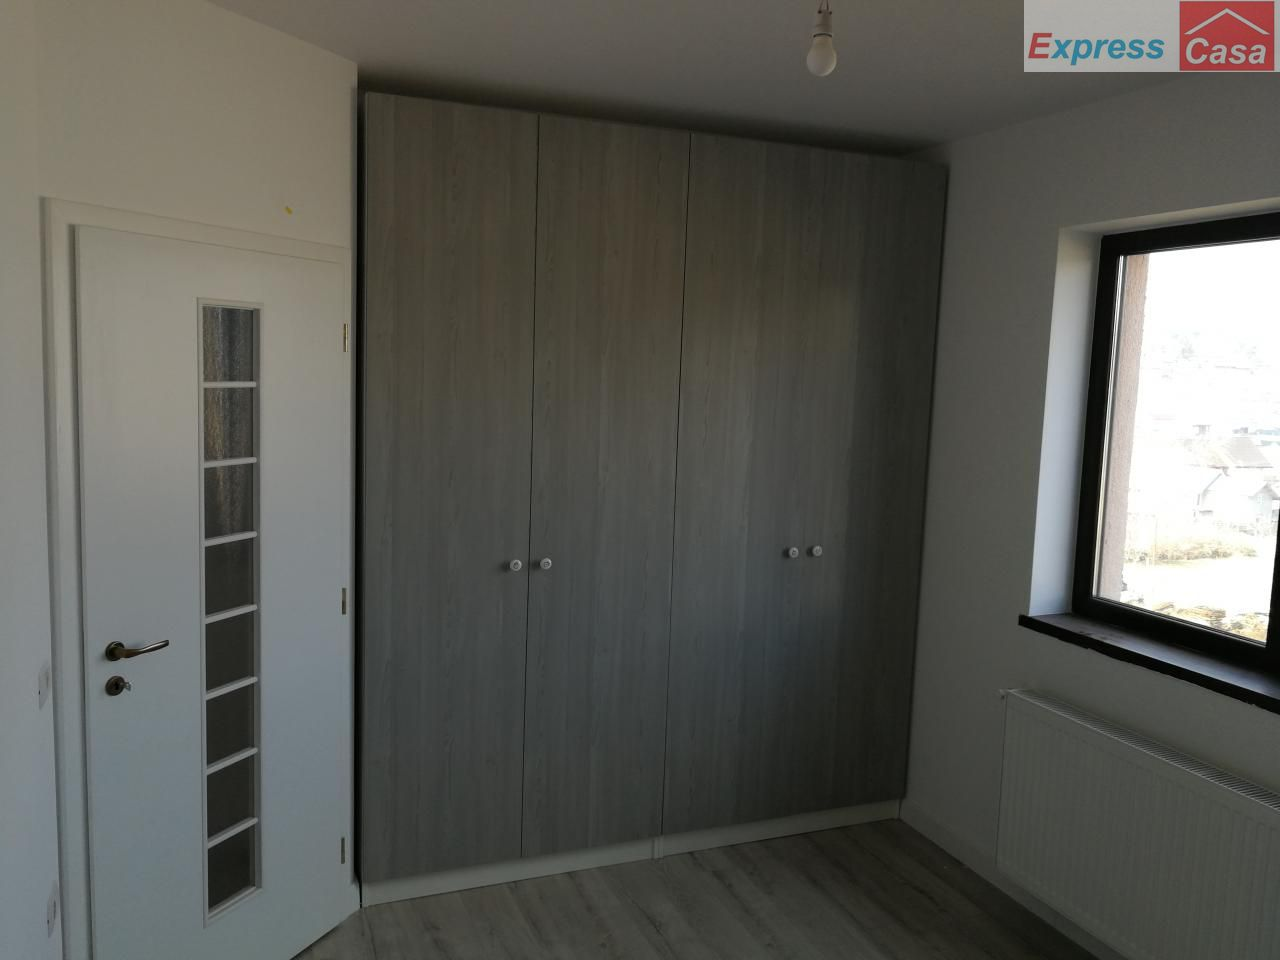 Apartament de vanzare, Iași (judet), Nicolina 1 - Foto 5